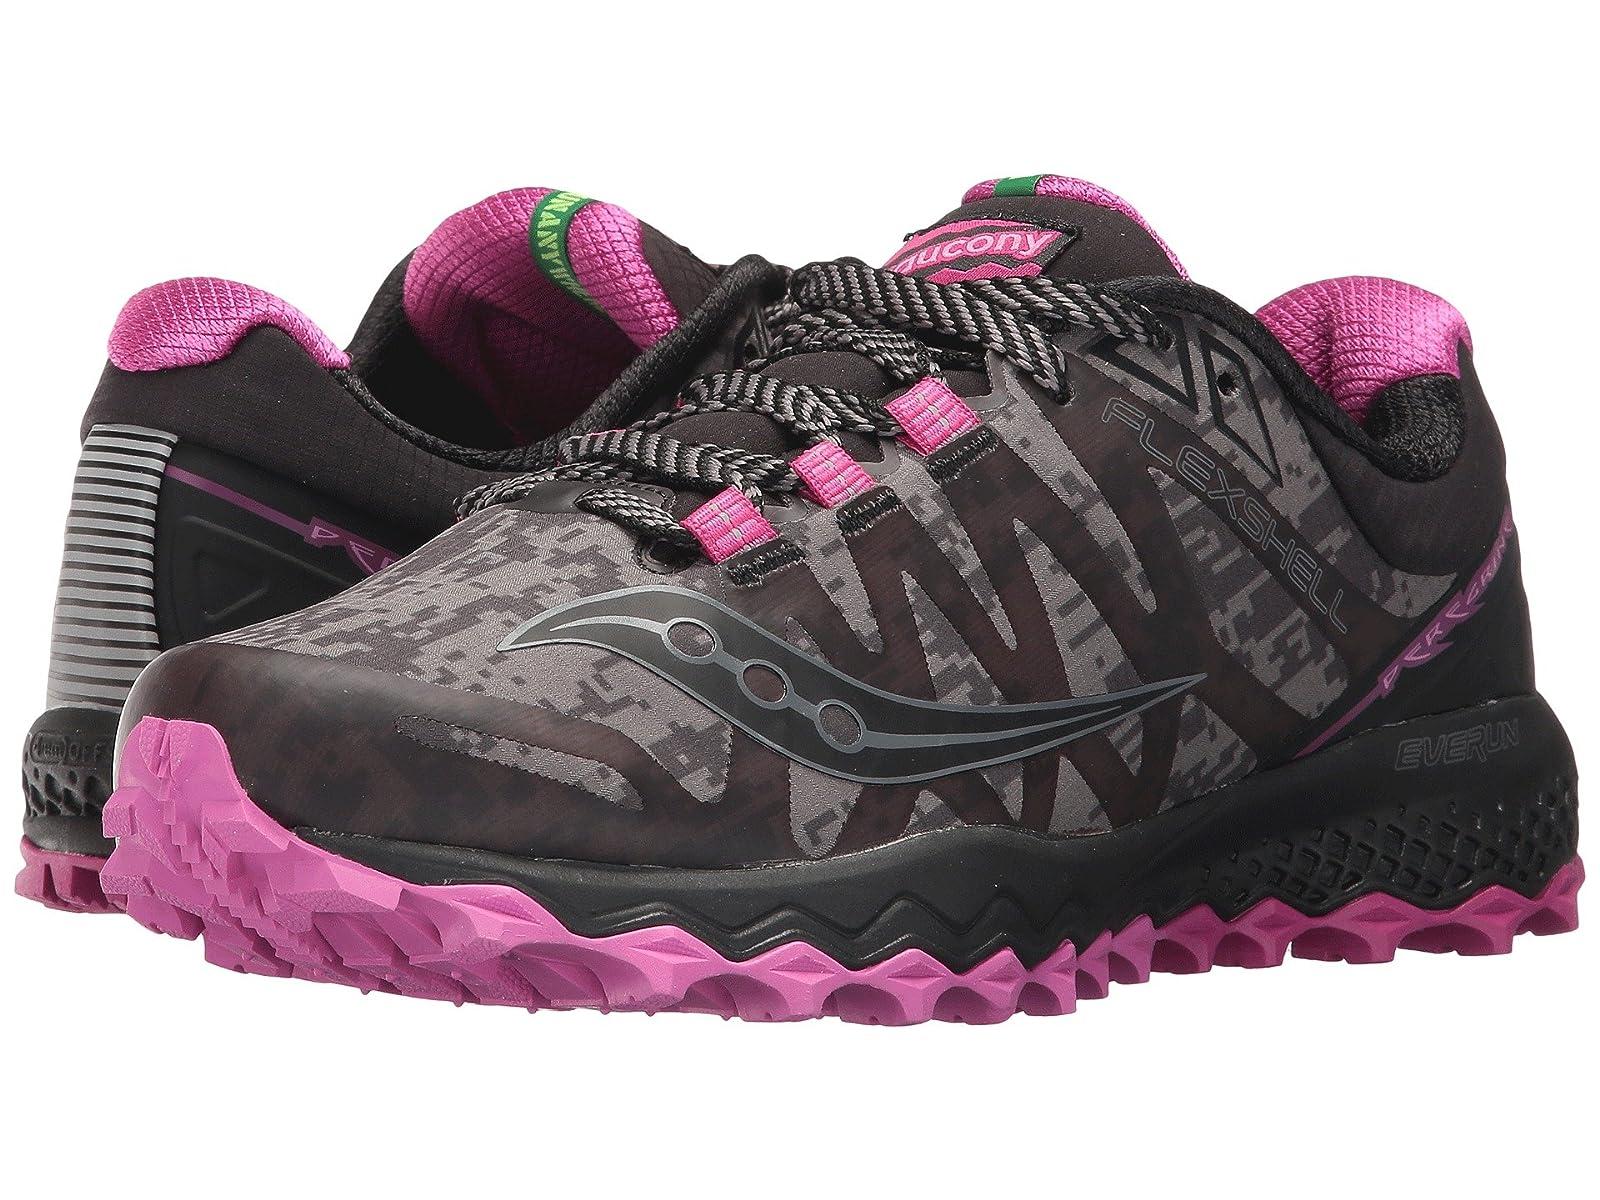 Saucony Peregrine 7 RunshieldCheap and distinctive eye-catching shoes